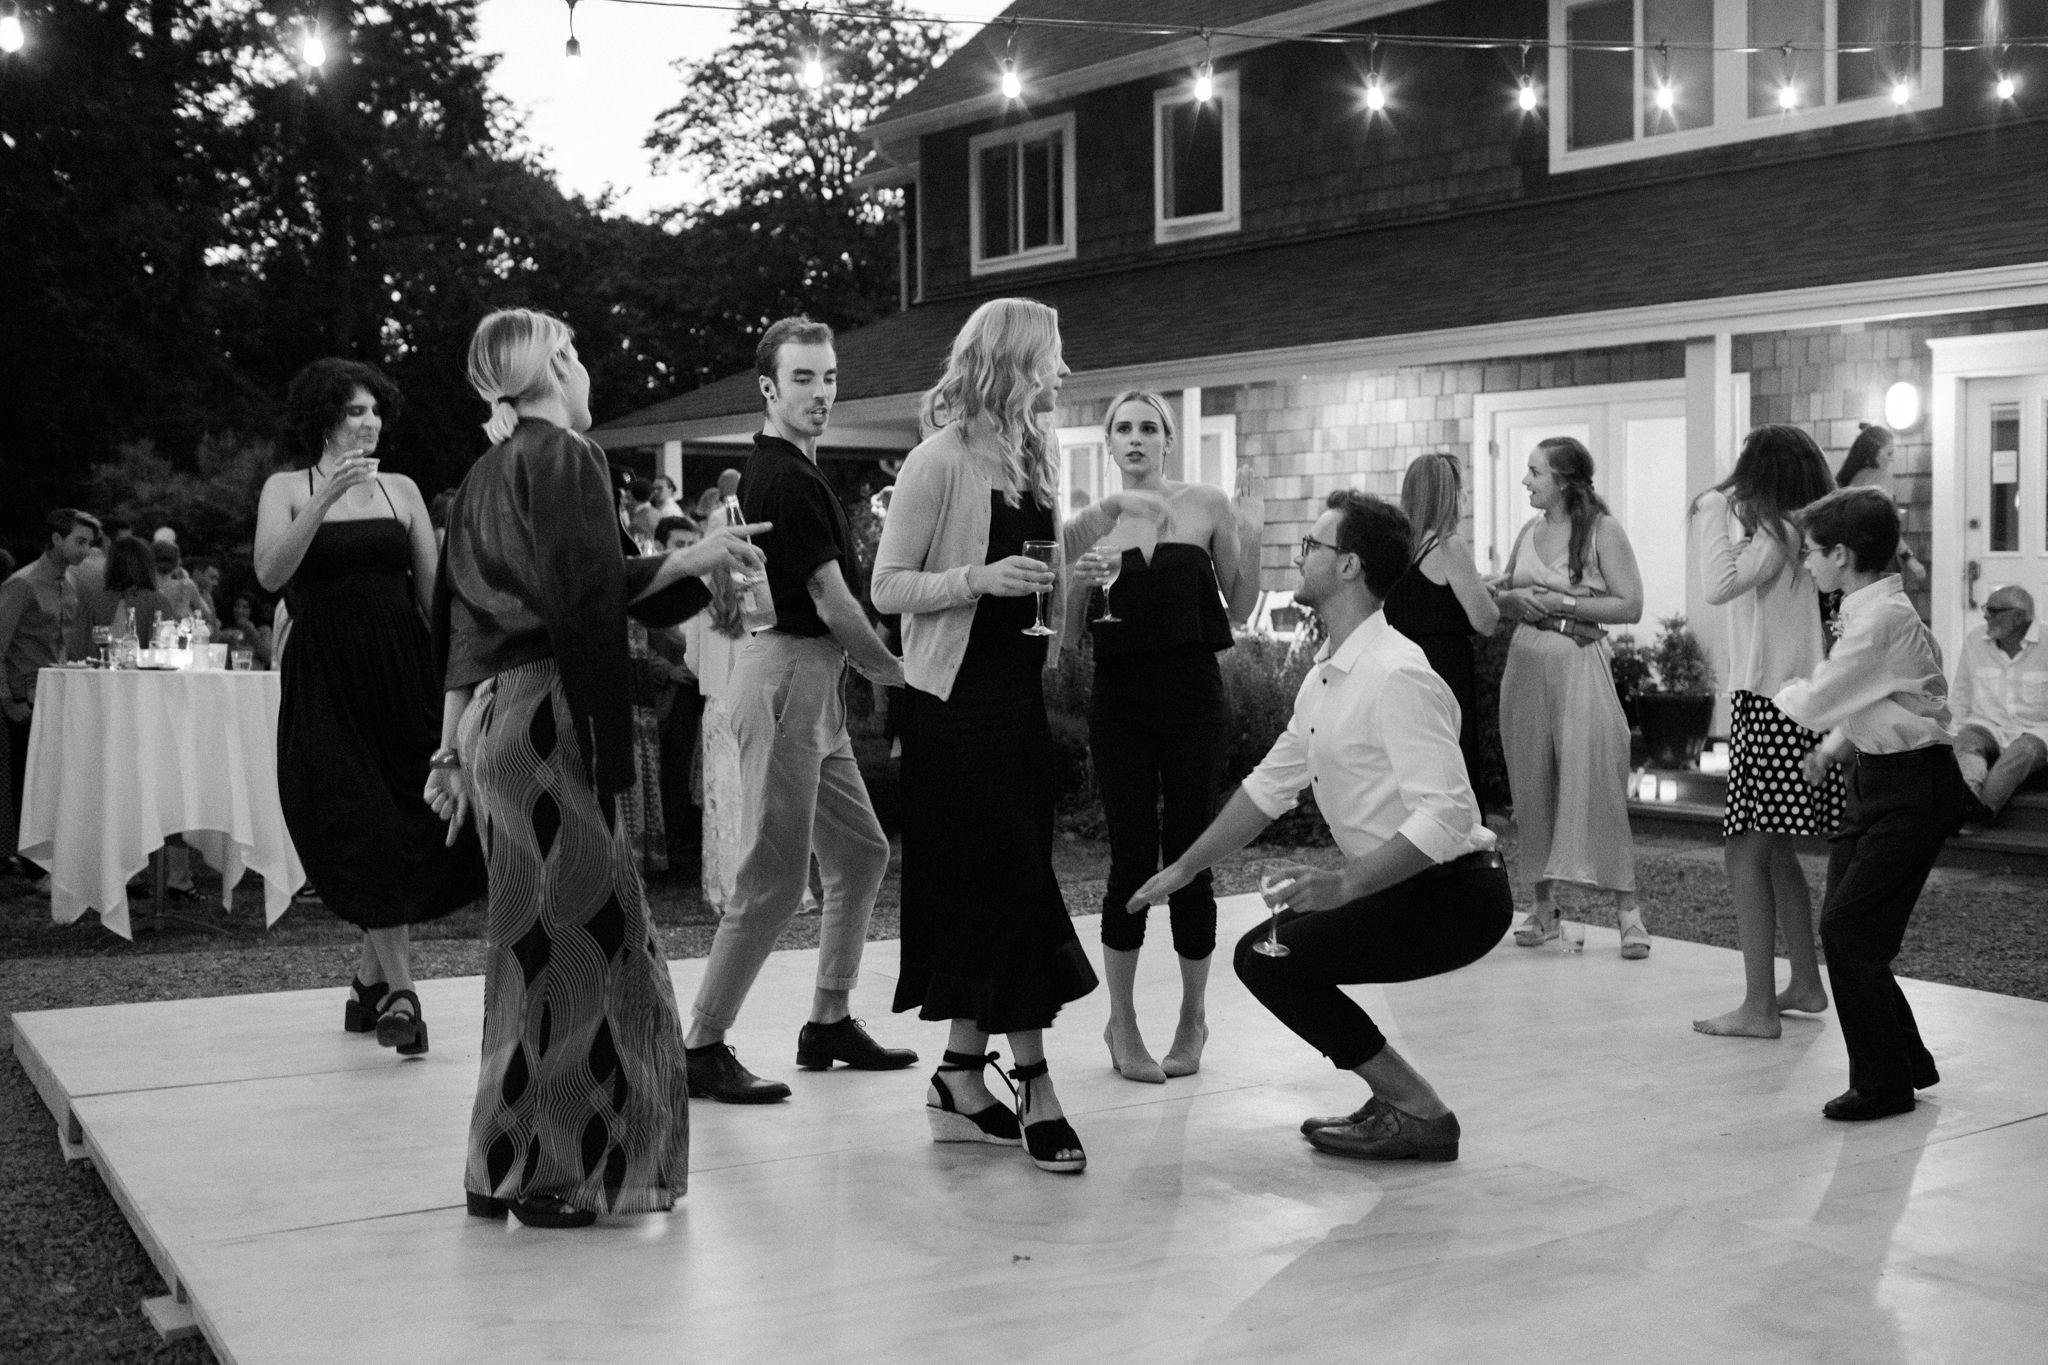 Backyard-Bainbridge-Island-Wedding-Alycia-Lovell-Photography-254.JPG